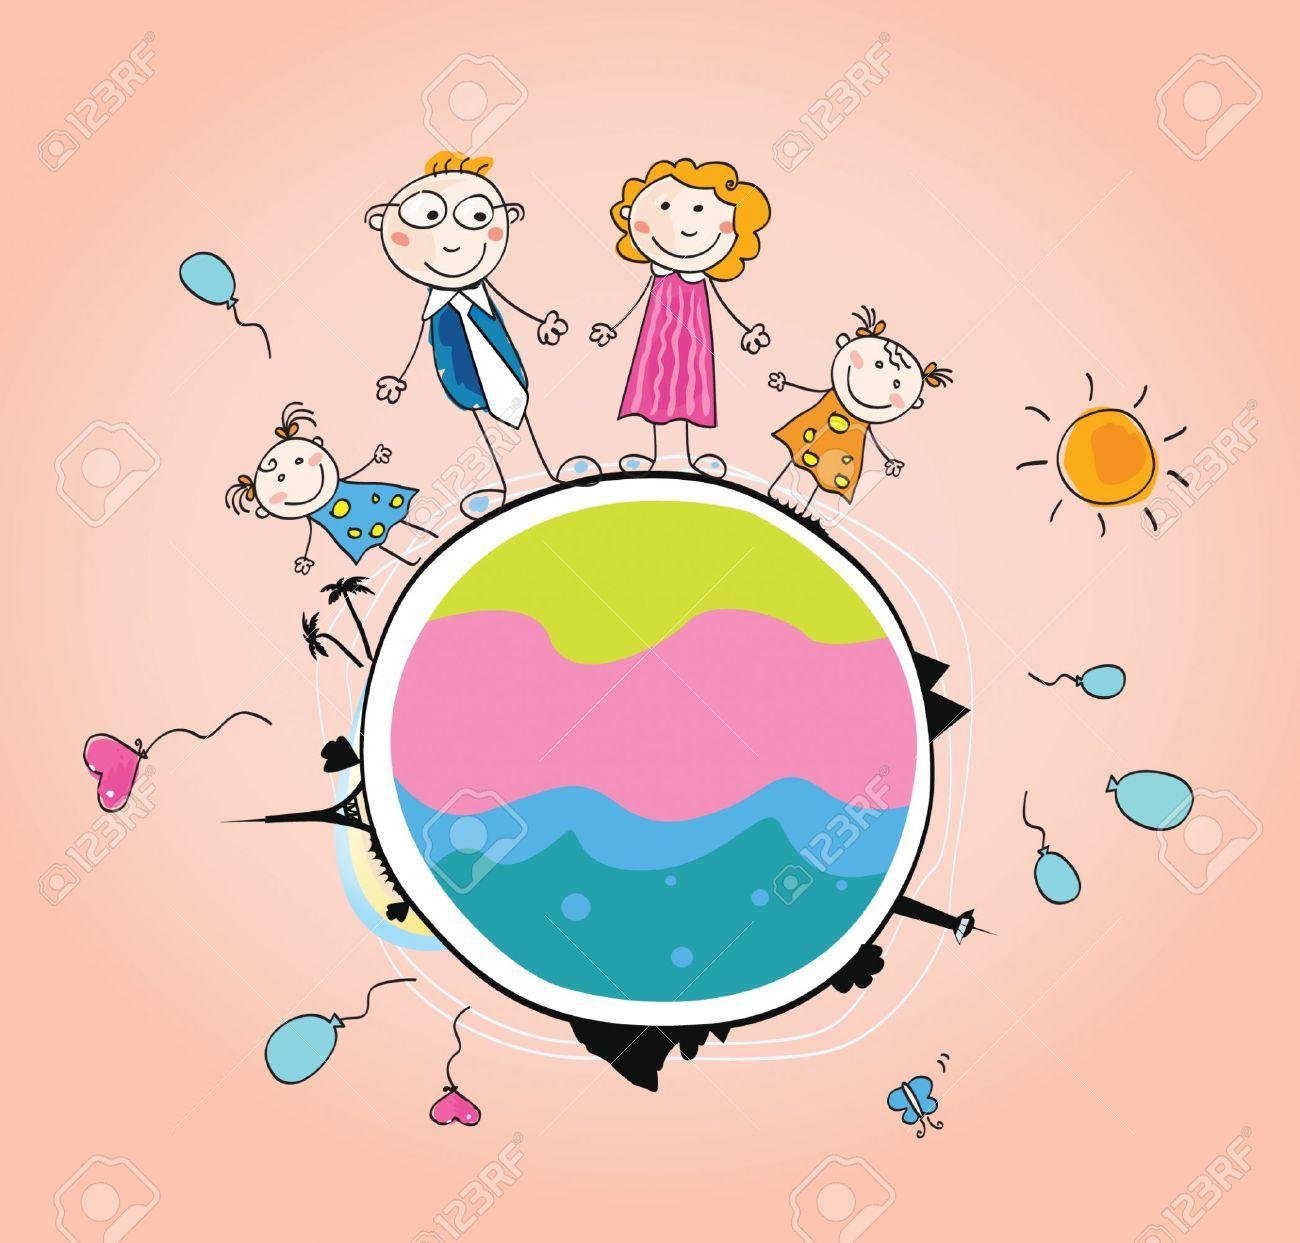 children's vector art - Google Search